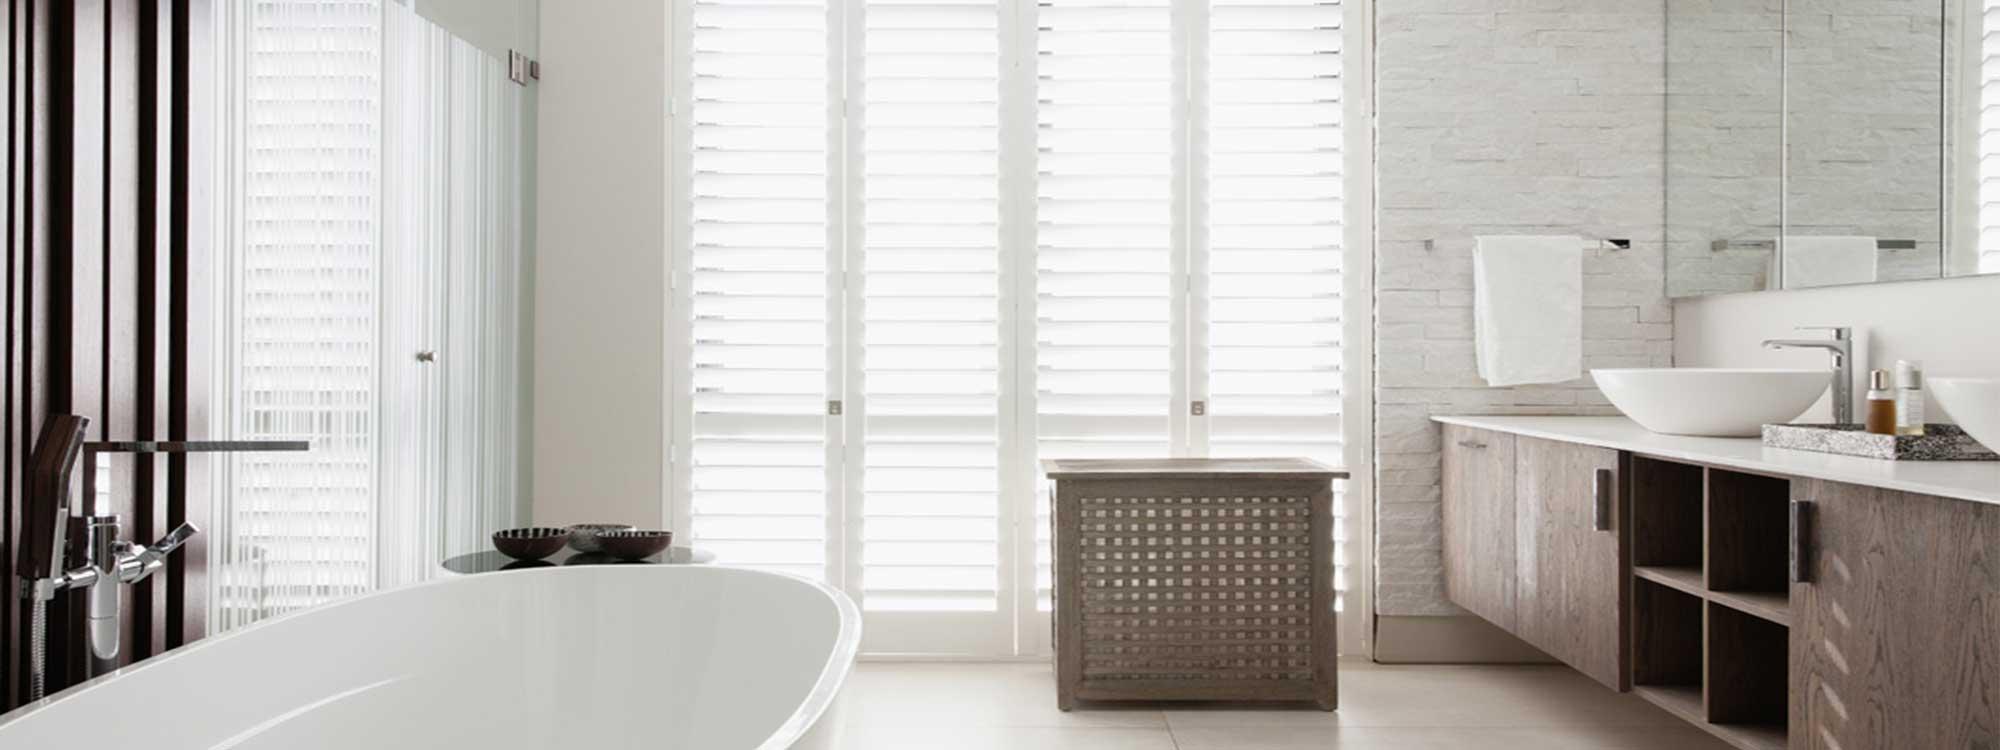 Decowood-shutters-bathroom-full-view-light